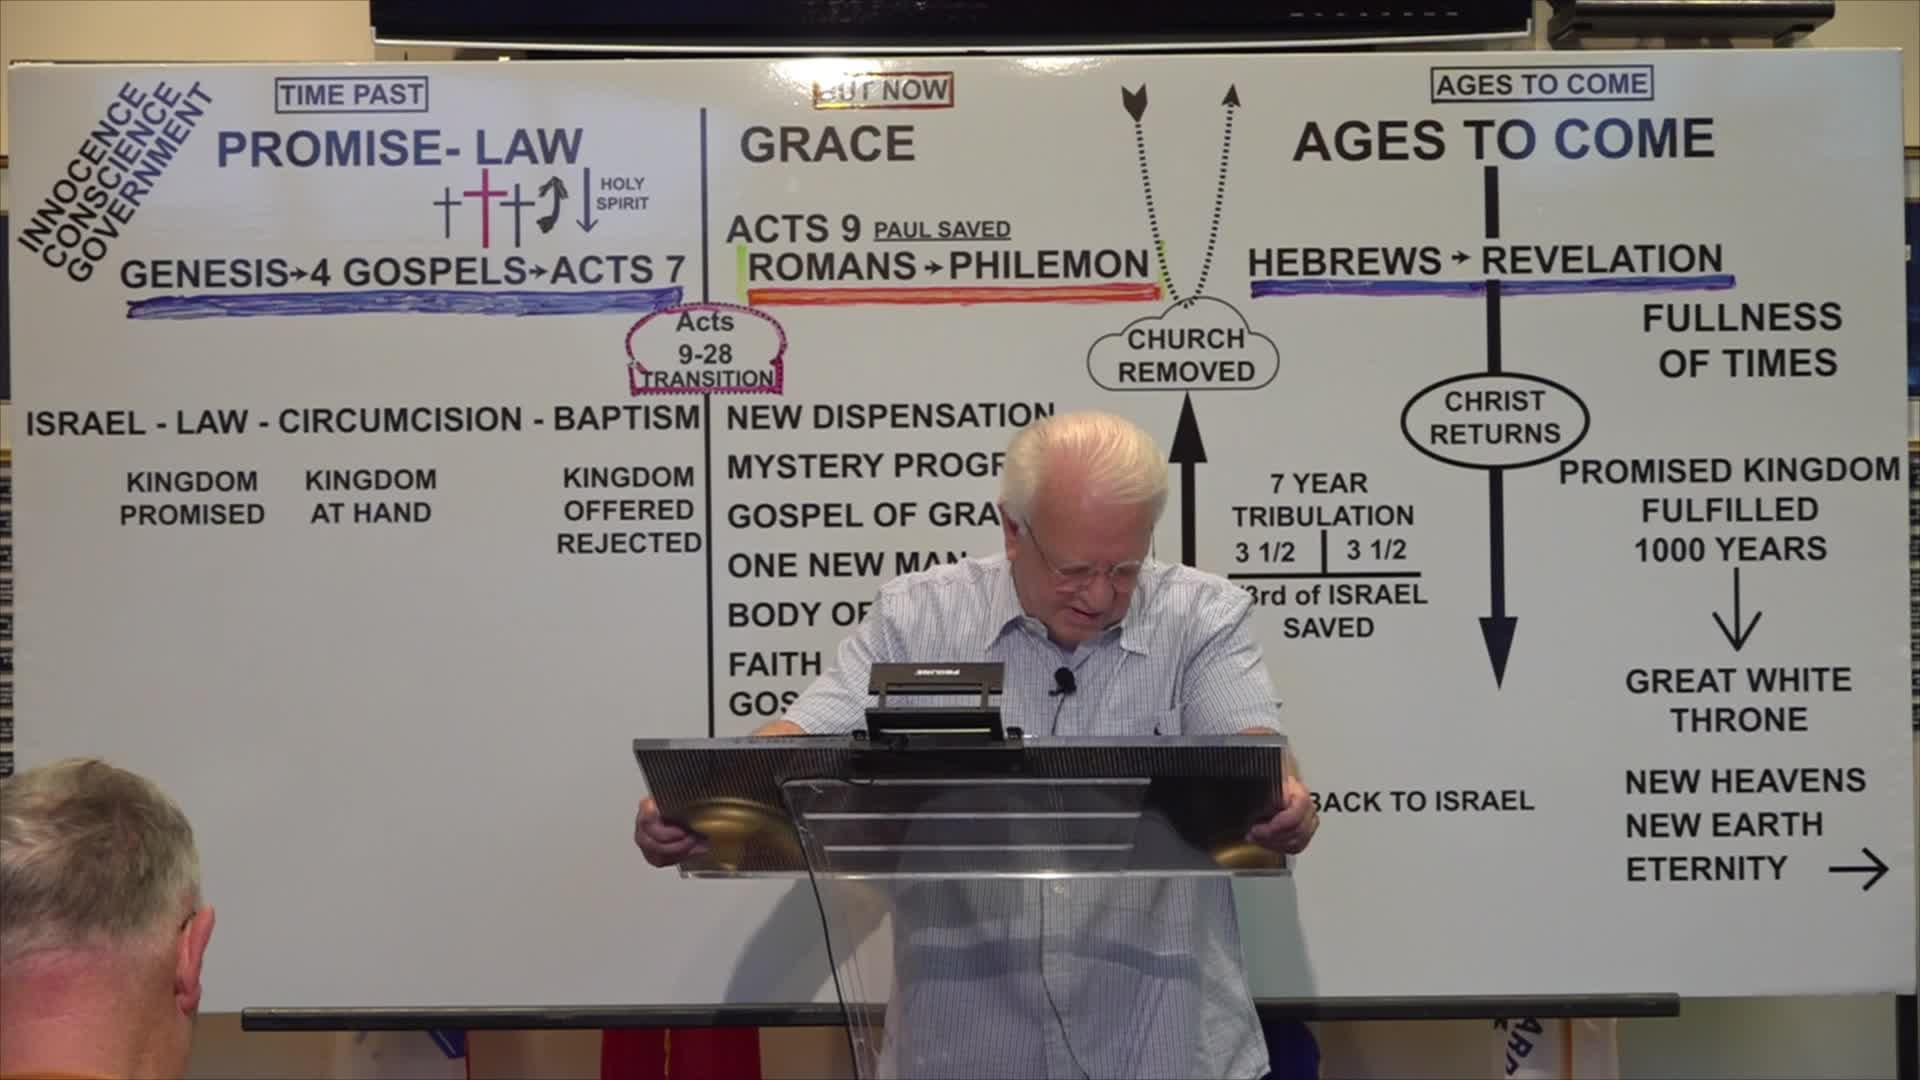 8-25-21 Revelation 2: 12-17